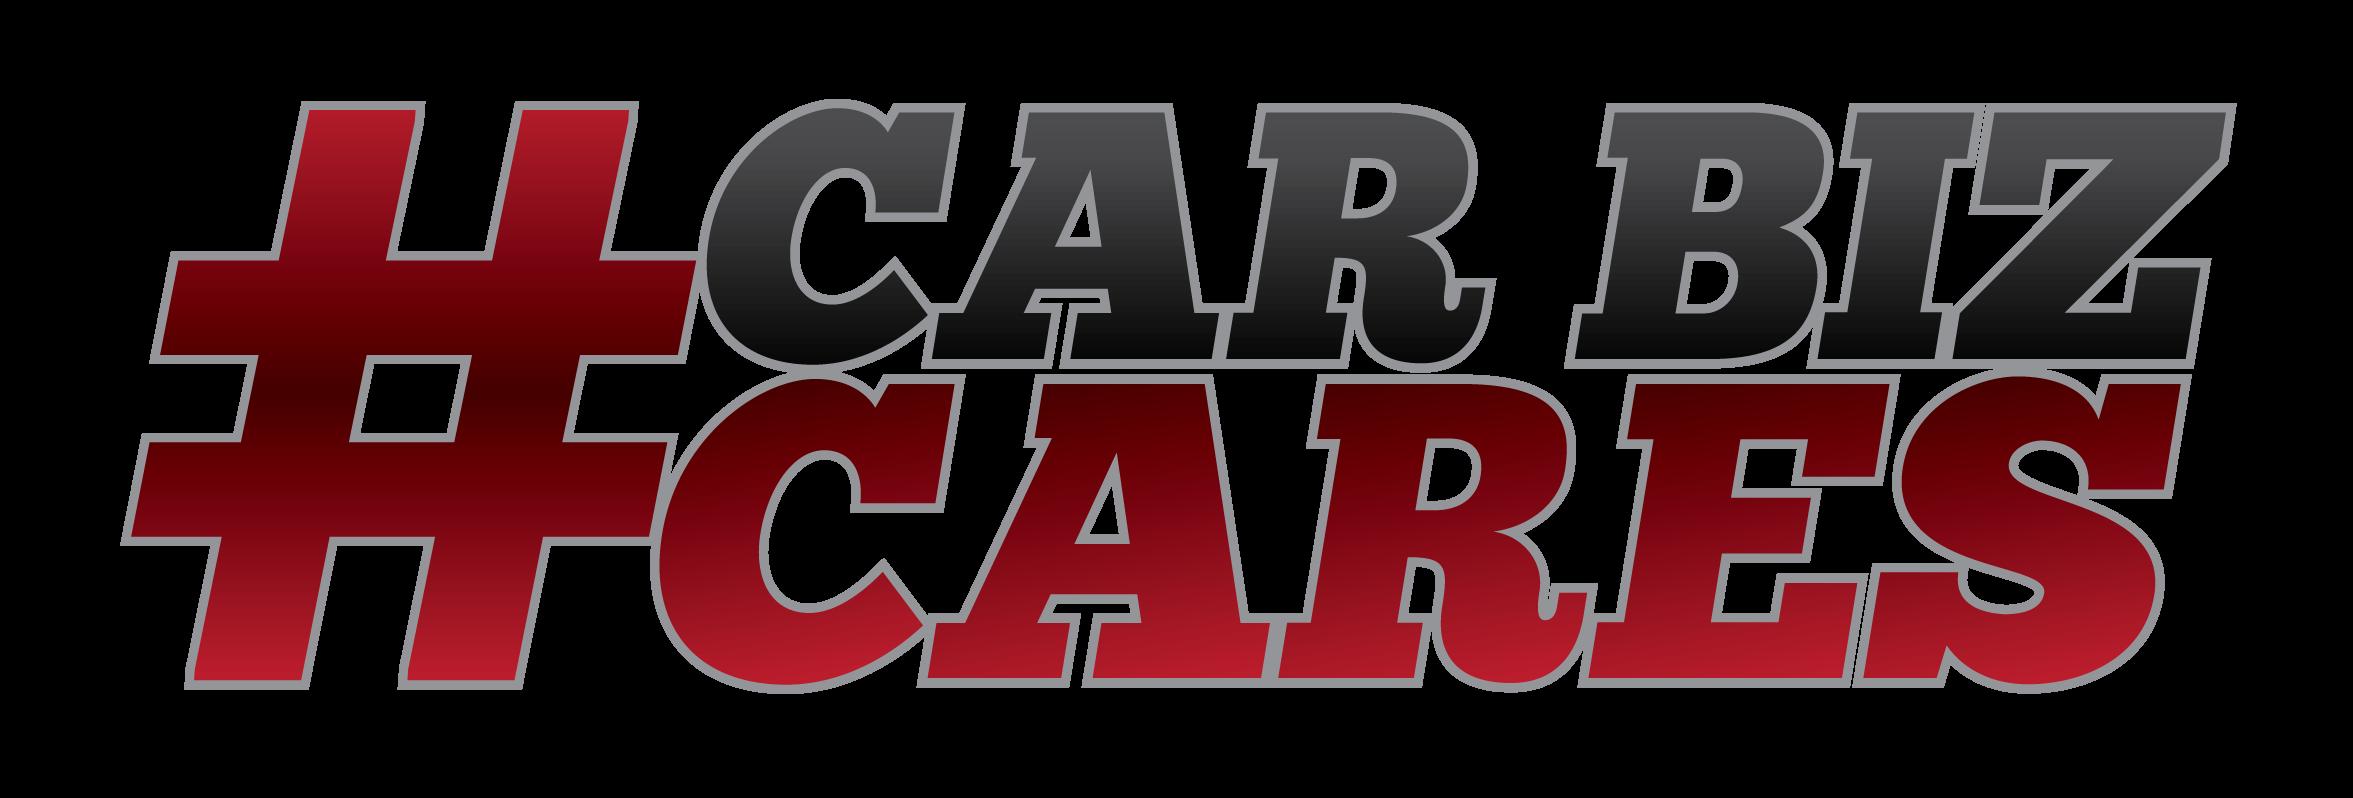 Car-Biz-Cares-Logo-Design-Hashtag2